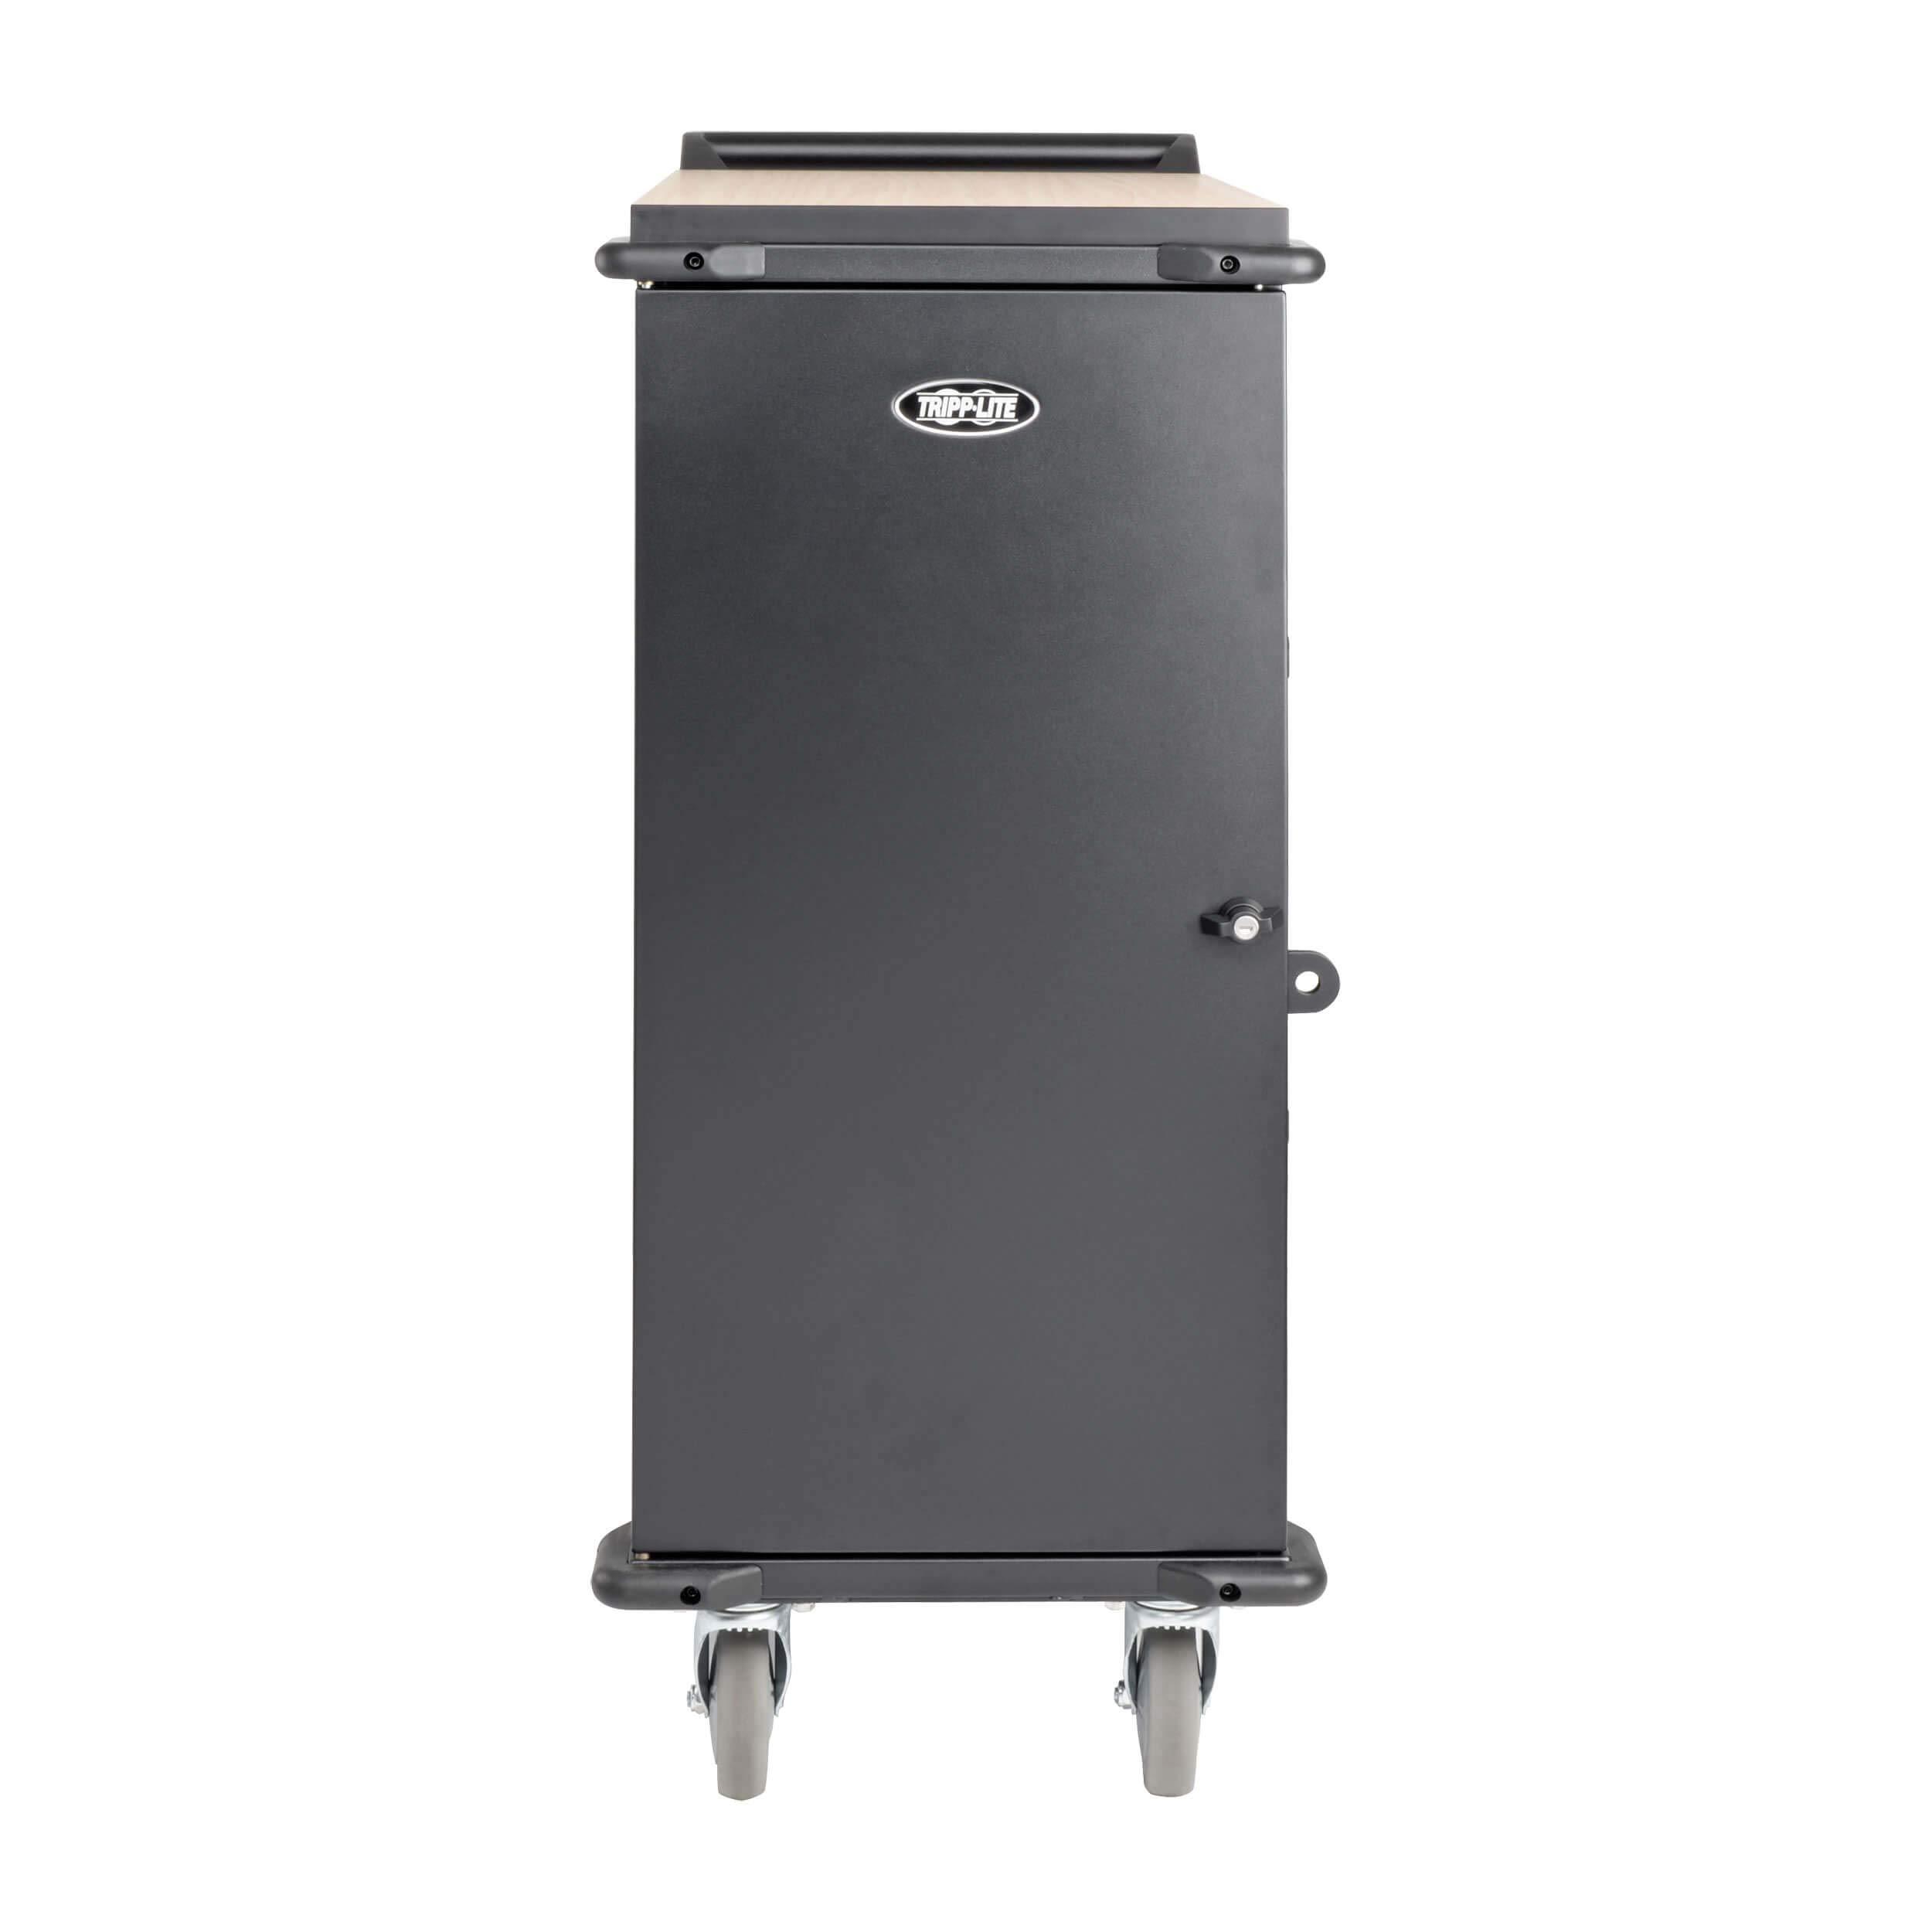 Tripp Lite 27-Port AC Mobile Charging Cart Storage Station for Chromebooks, iPads, Laptops, Tablets, Black (CSC27AC) by Tripp Lite (Image #1)